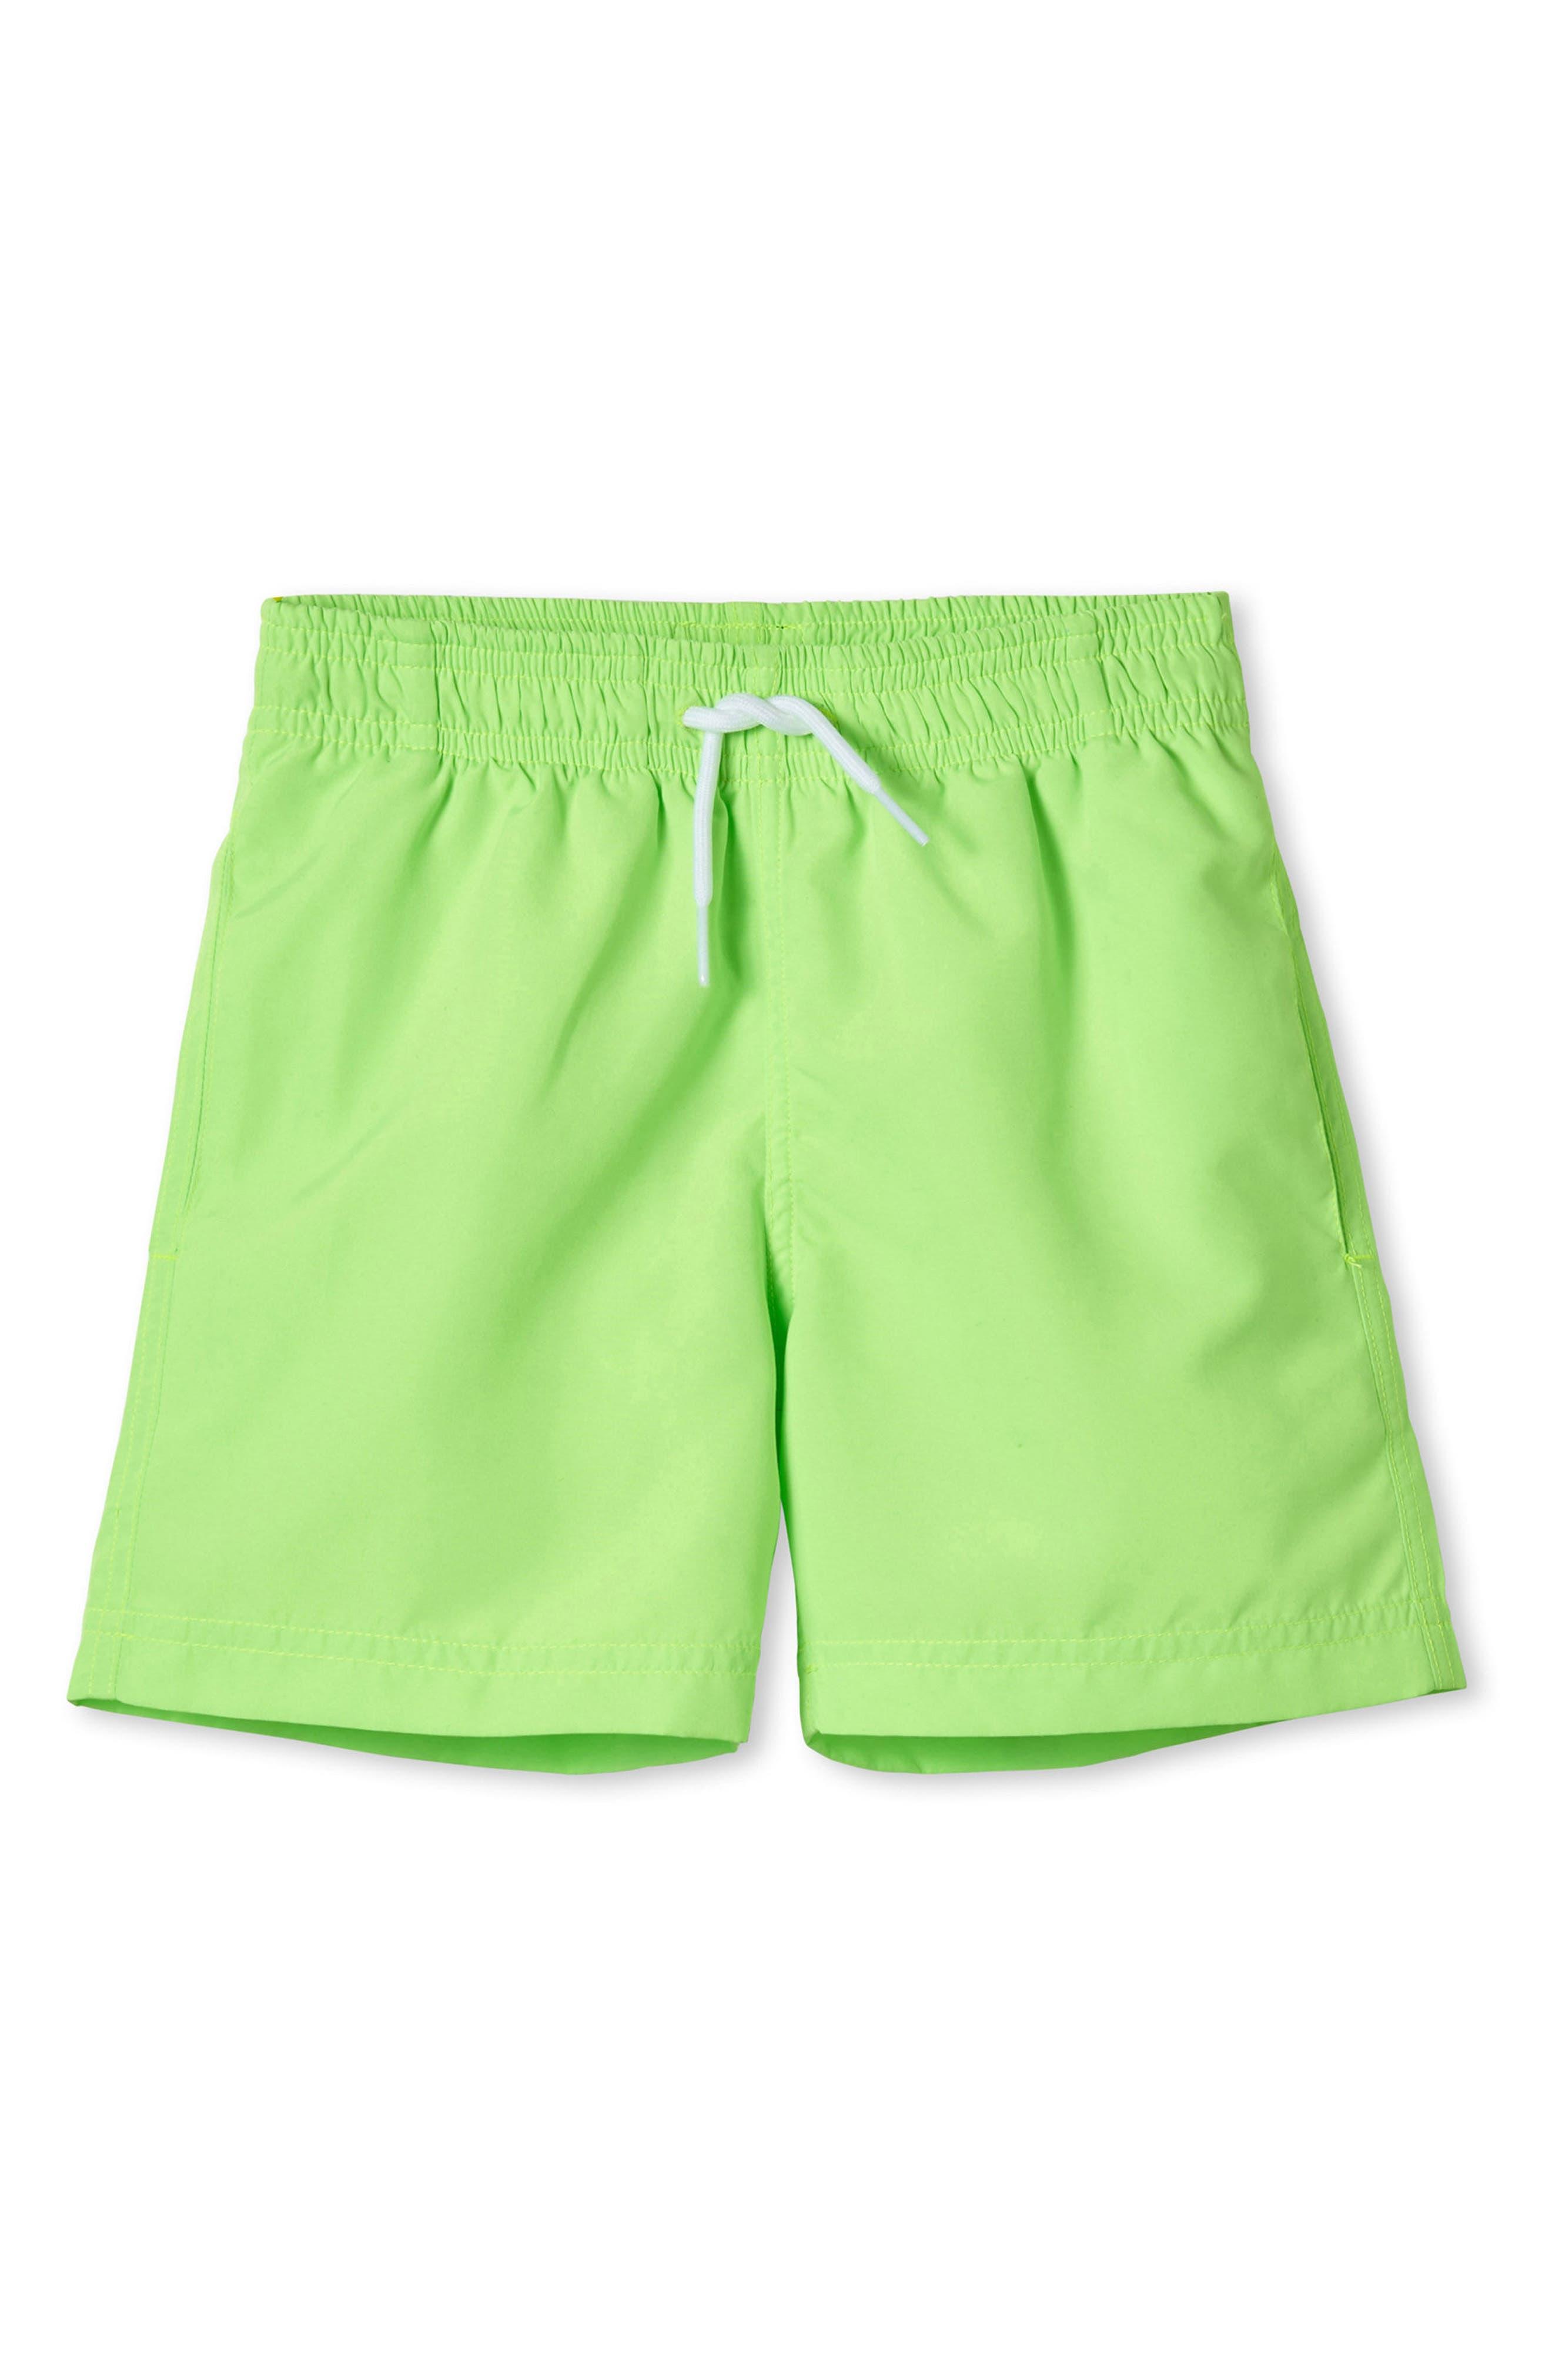 STELLA COVE,                             Neon Green Swim Trunks,                             Main thumbnail 1, color,                             340